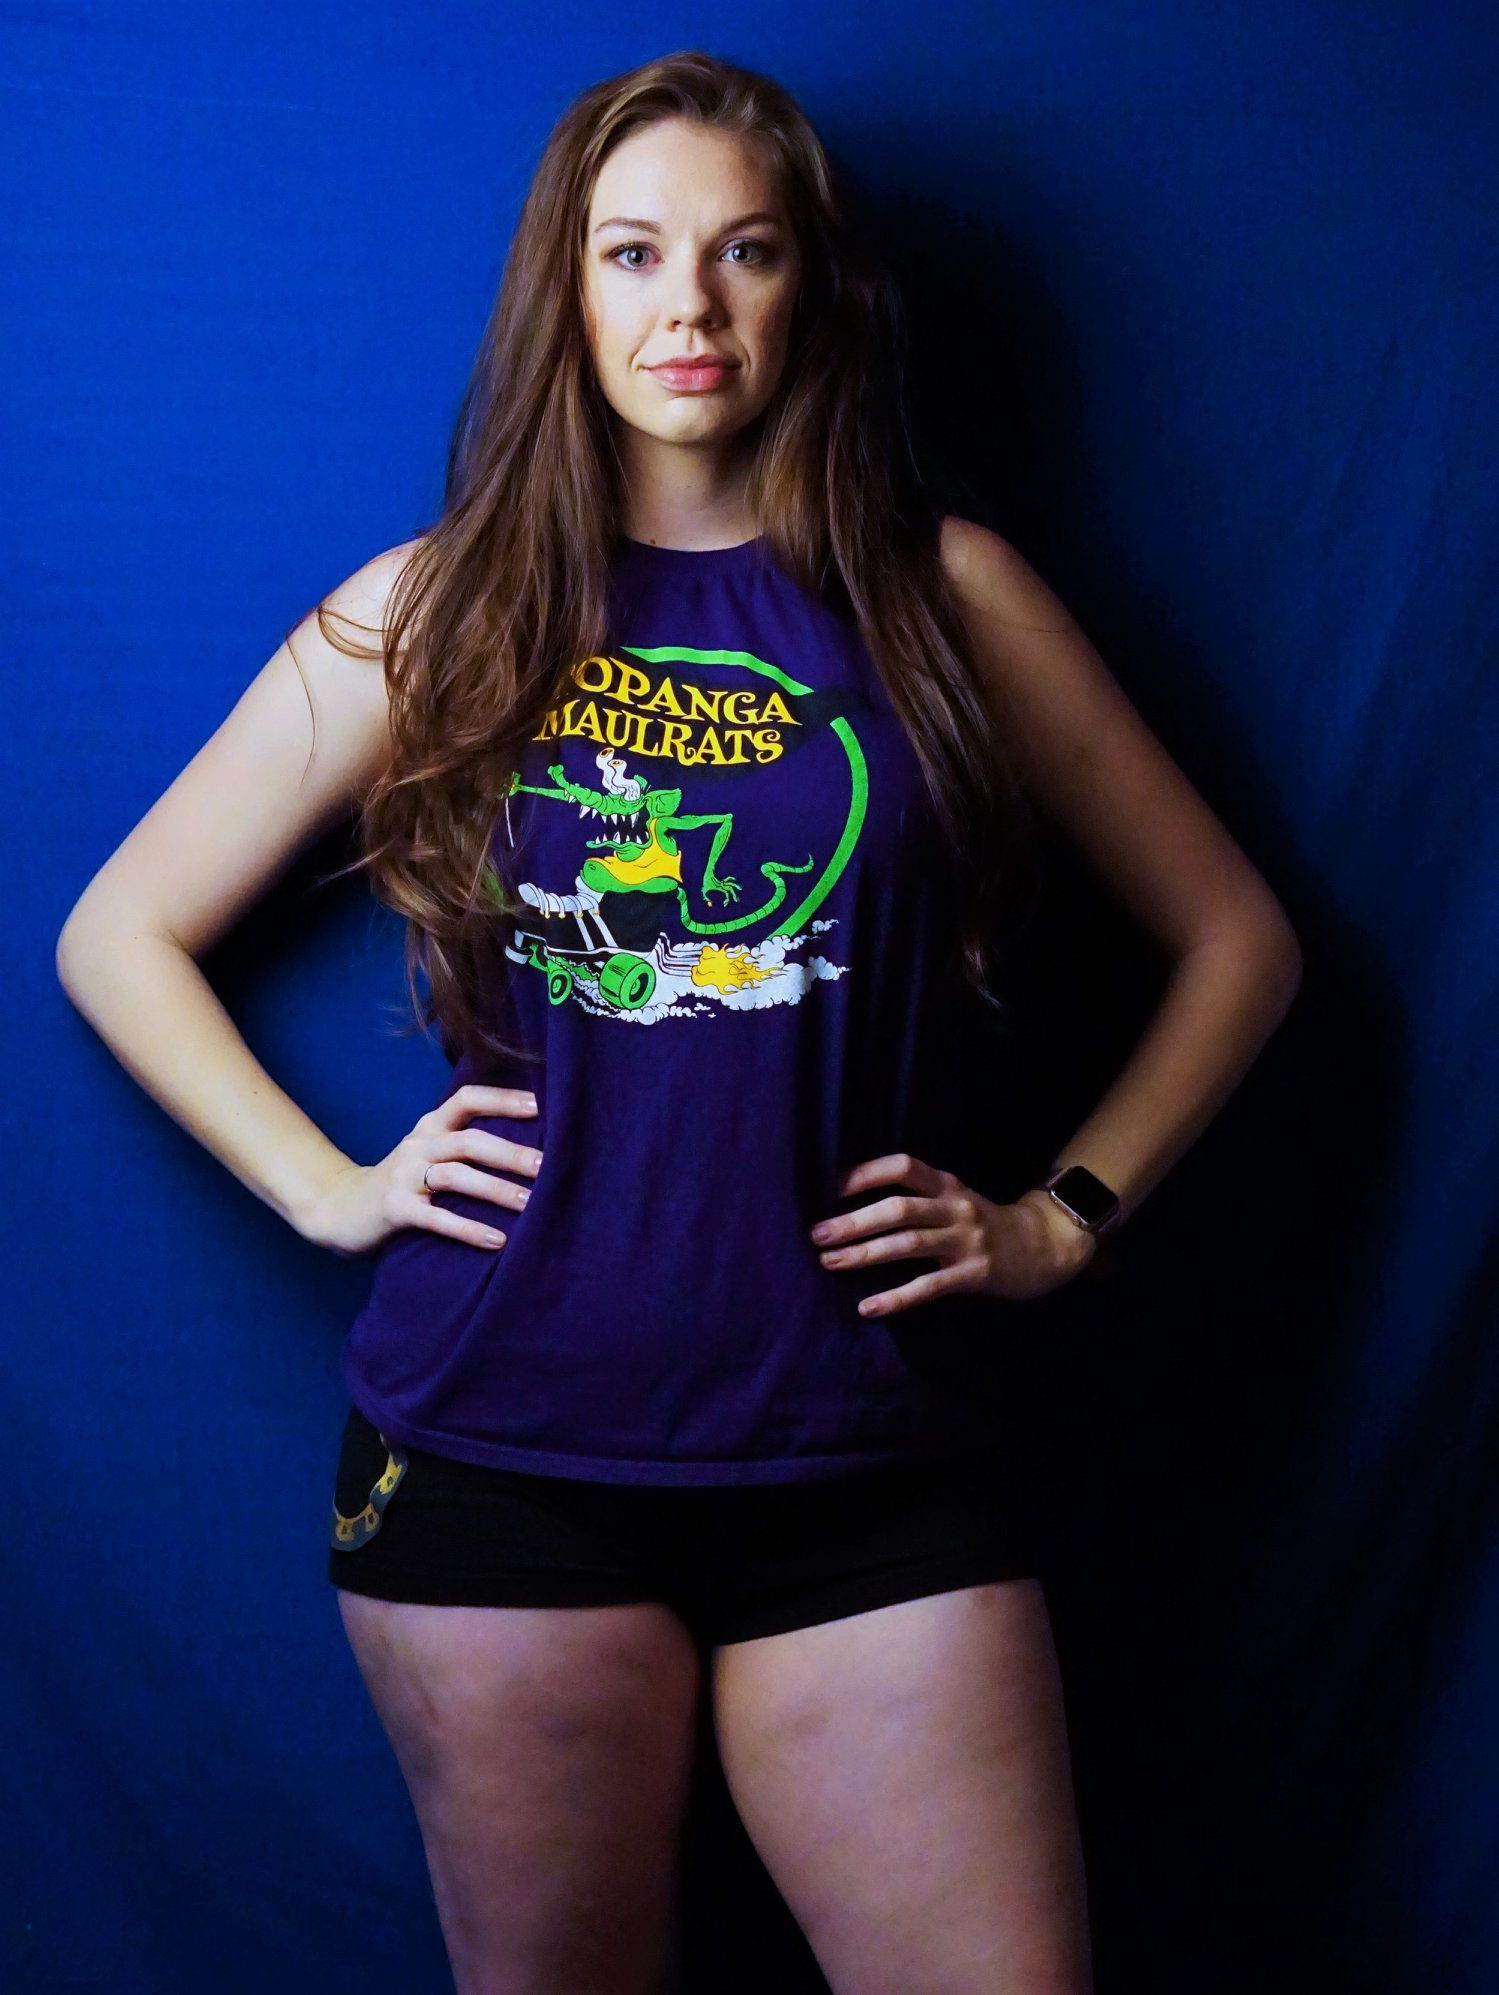 Xena Warrior Skateress #74